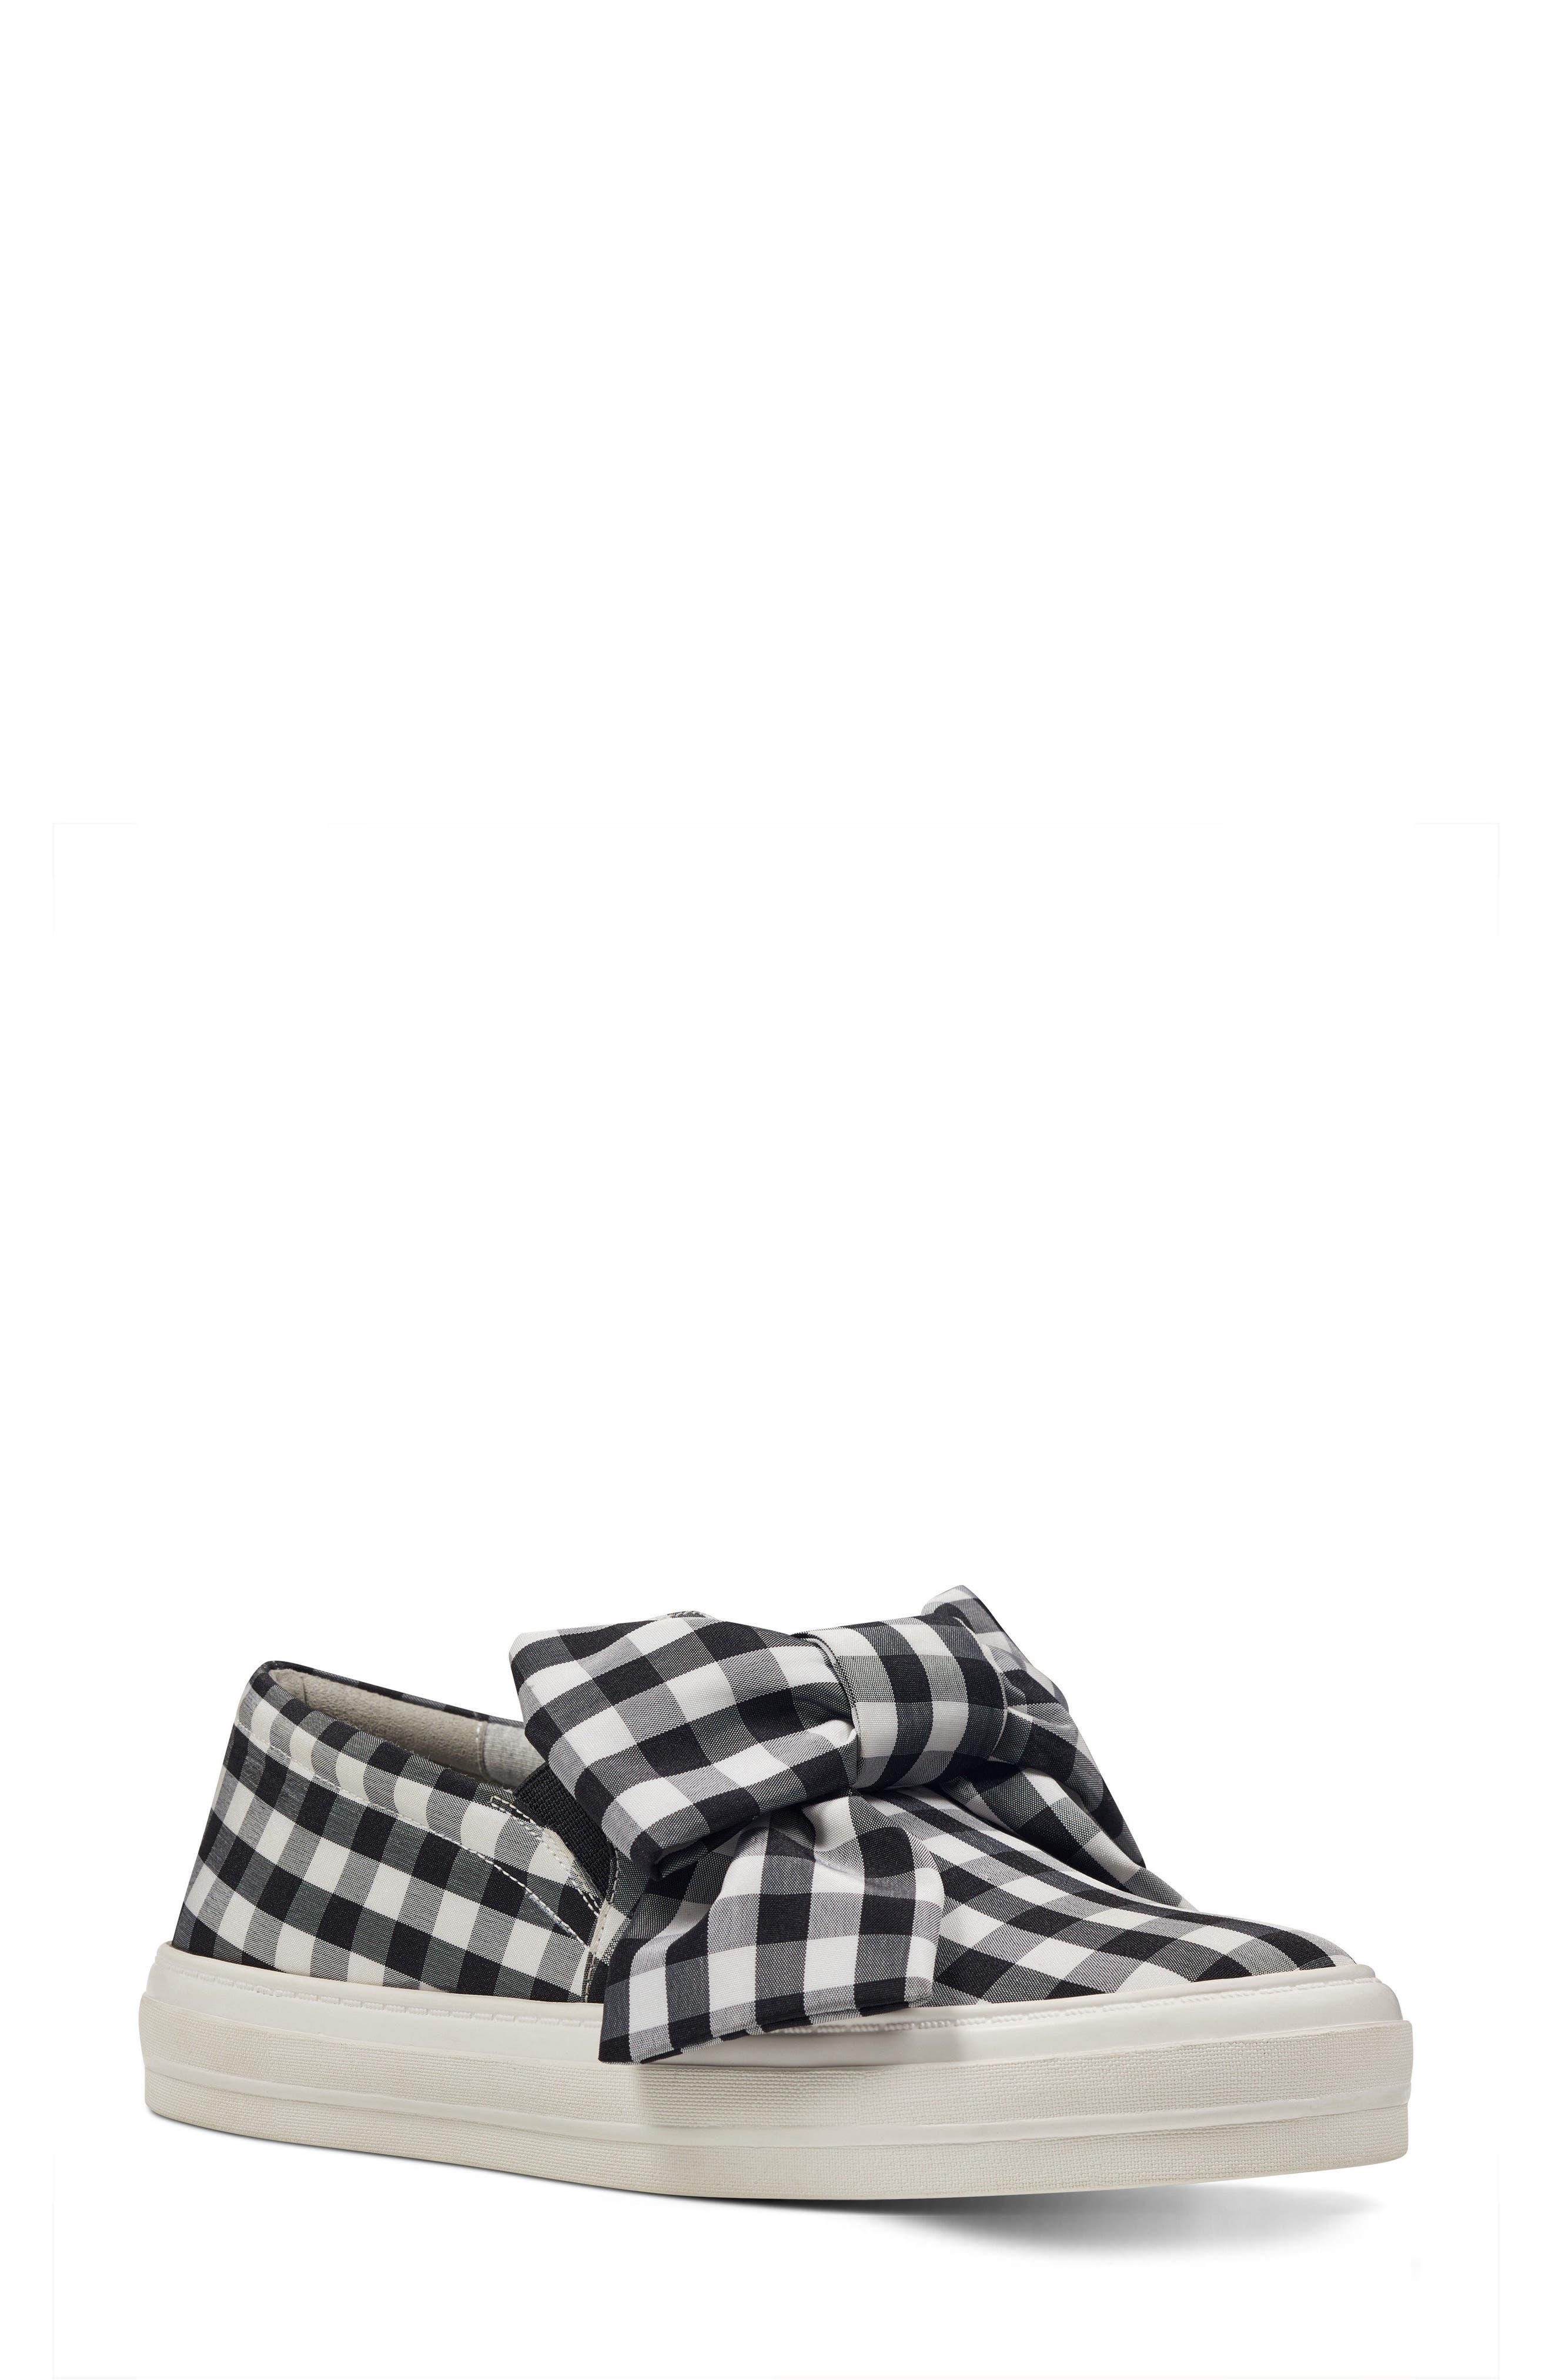 Onosha Bow Slip-On Sneaker,                             Main thumbnail 1, color,                             Black/ White Fabric